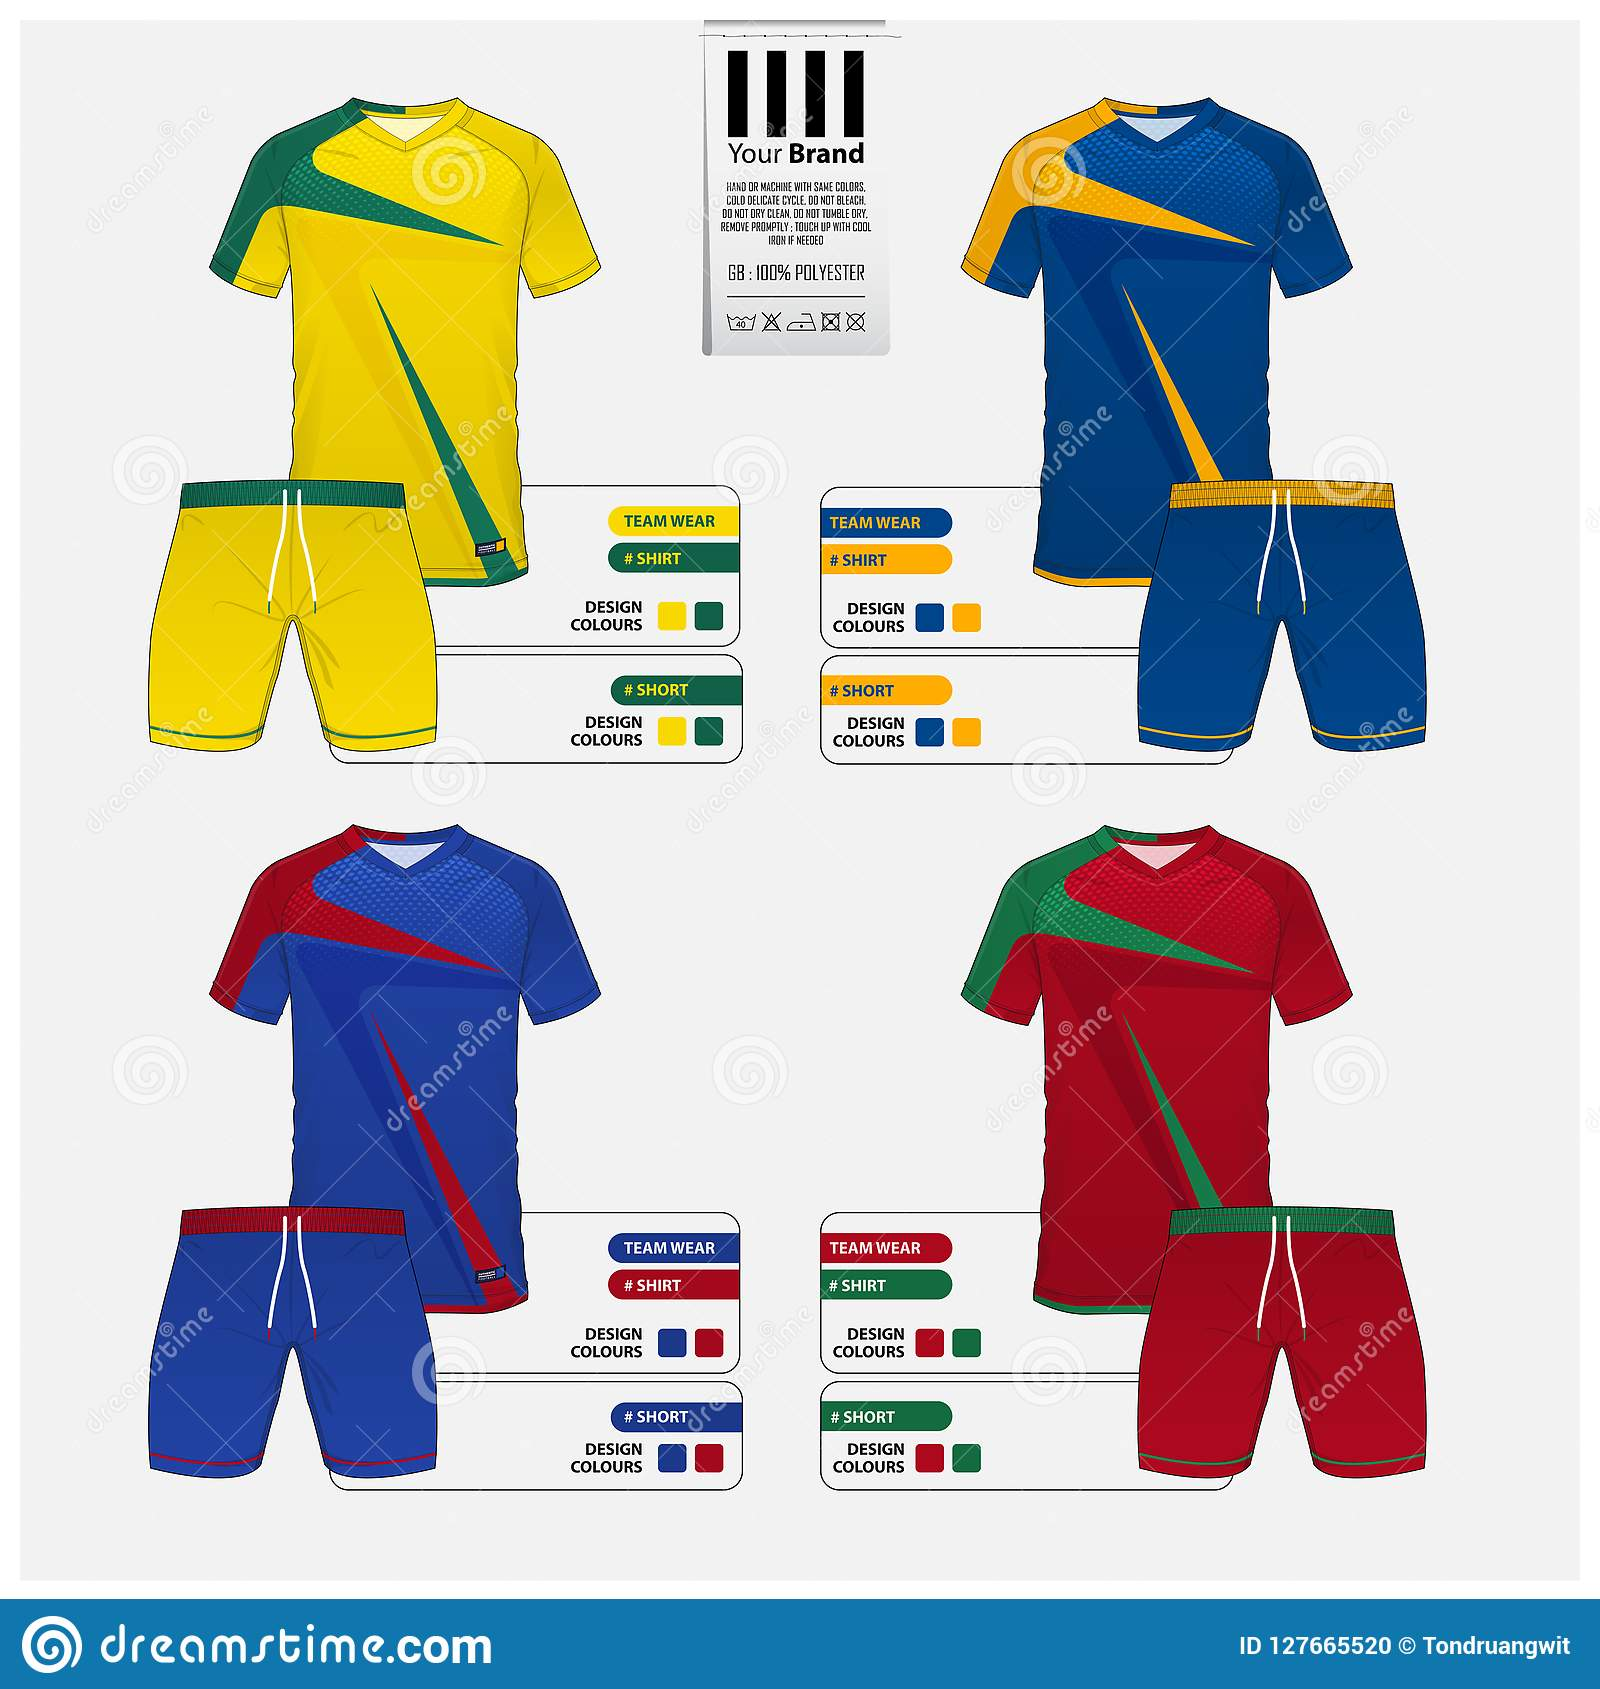 abb27020e Soccer jersey or football kit template design for football club. Set of Blue